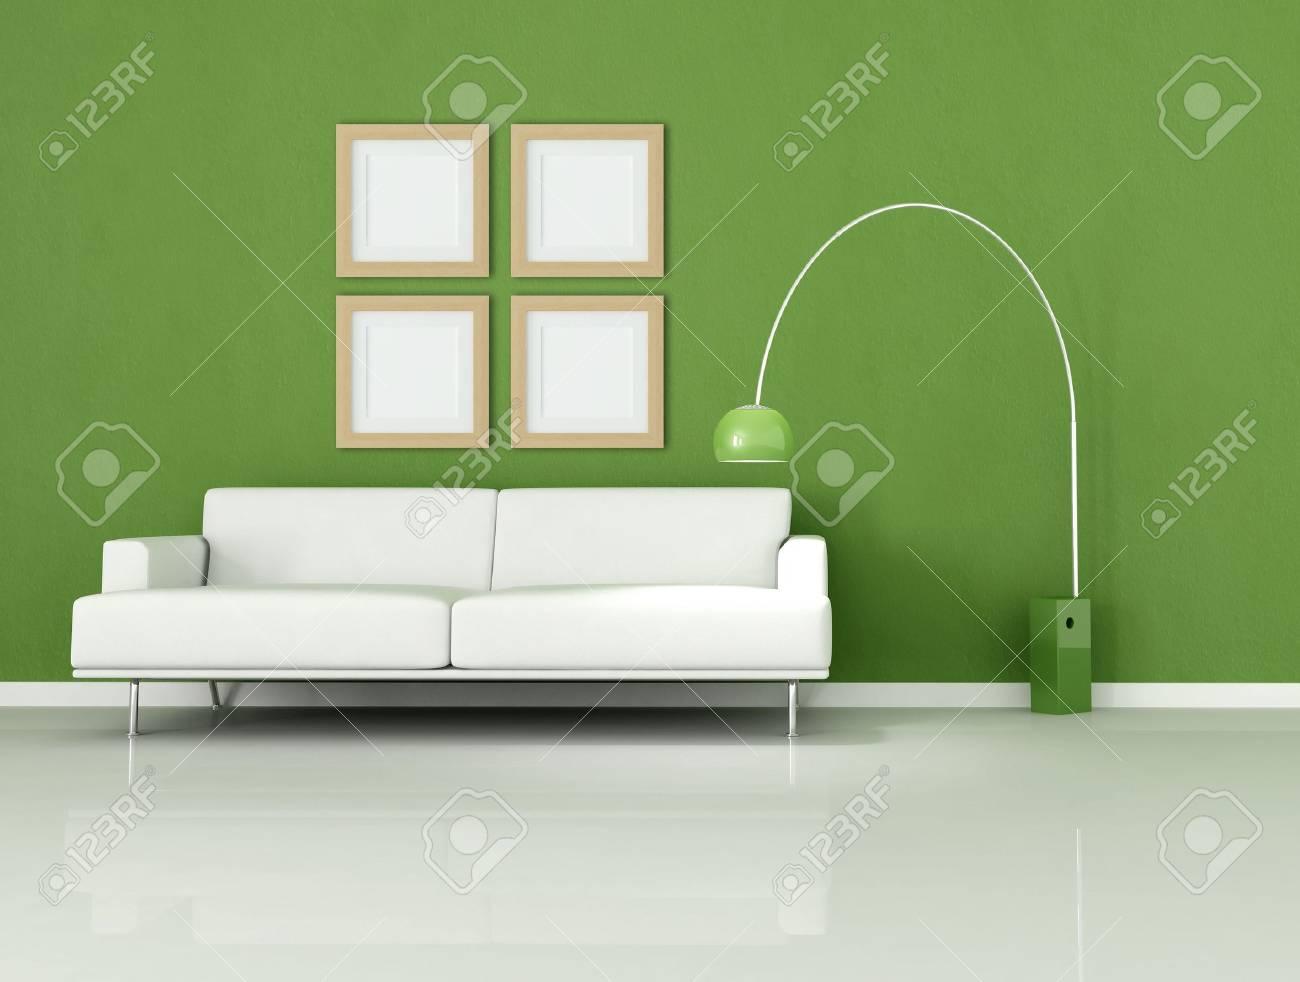 Stock Photo   White Sofa In A Minimal Green Room